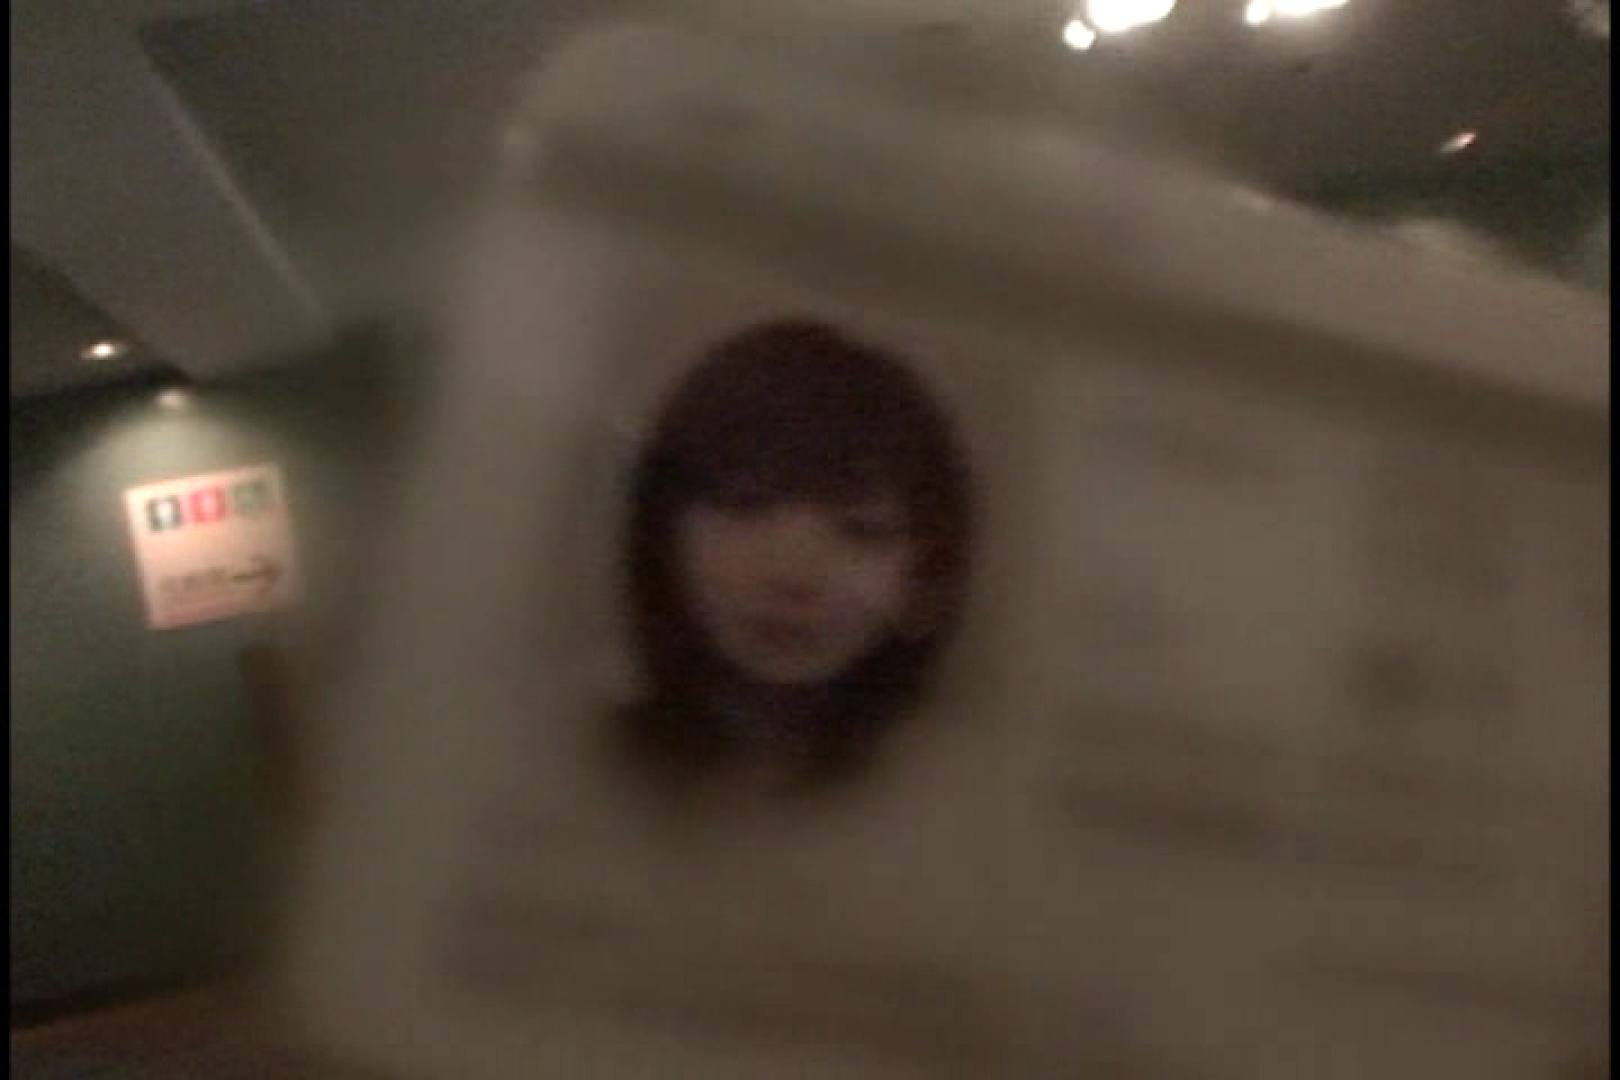 JDハンター全国ツアー vol.019 前編 女子大生のエロ動画 | 0  103PIX 39